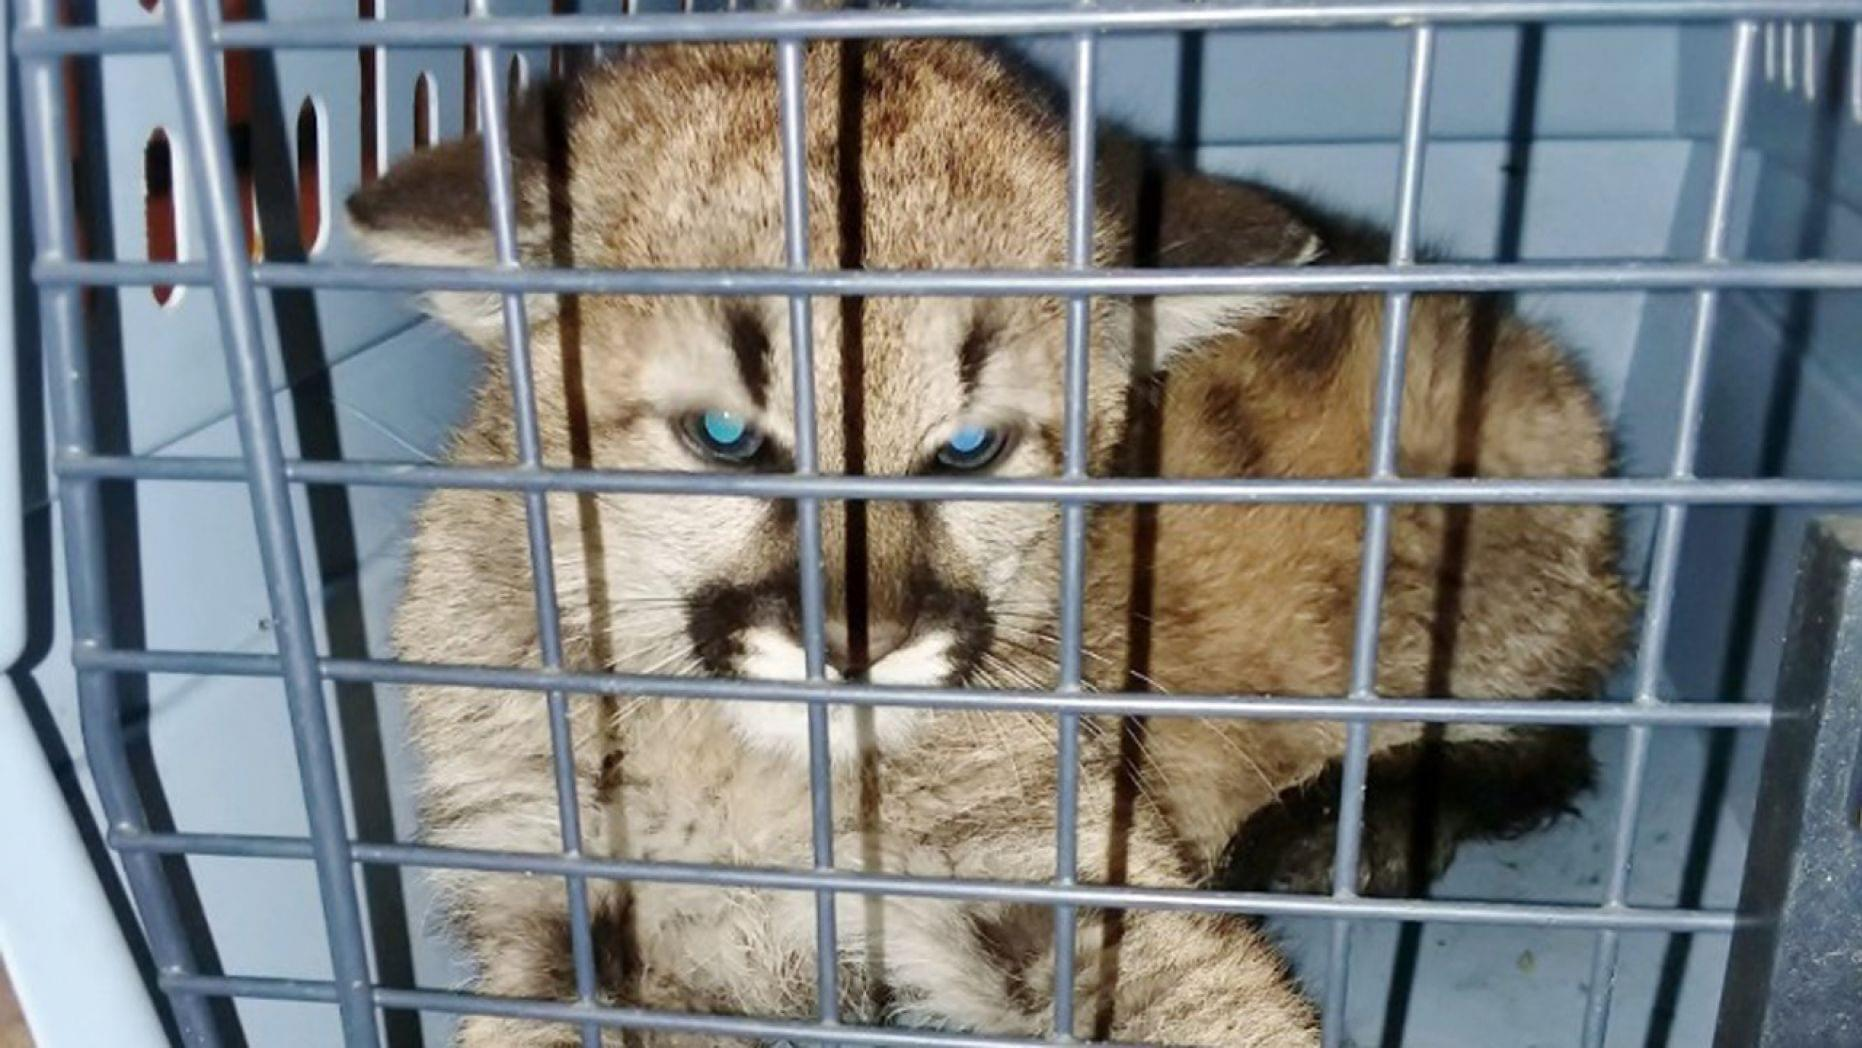 School Principal Arrested At Strip Club On Field Trip & Neighbors Capture Lion Cub, Feed It Brats